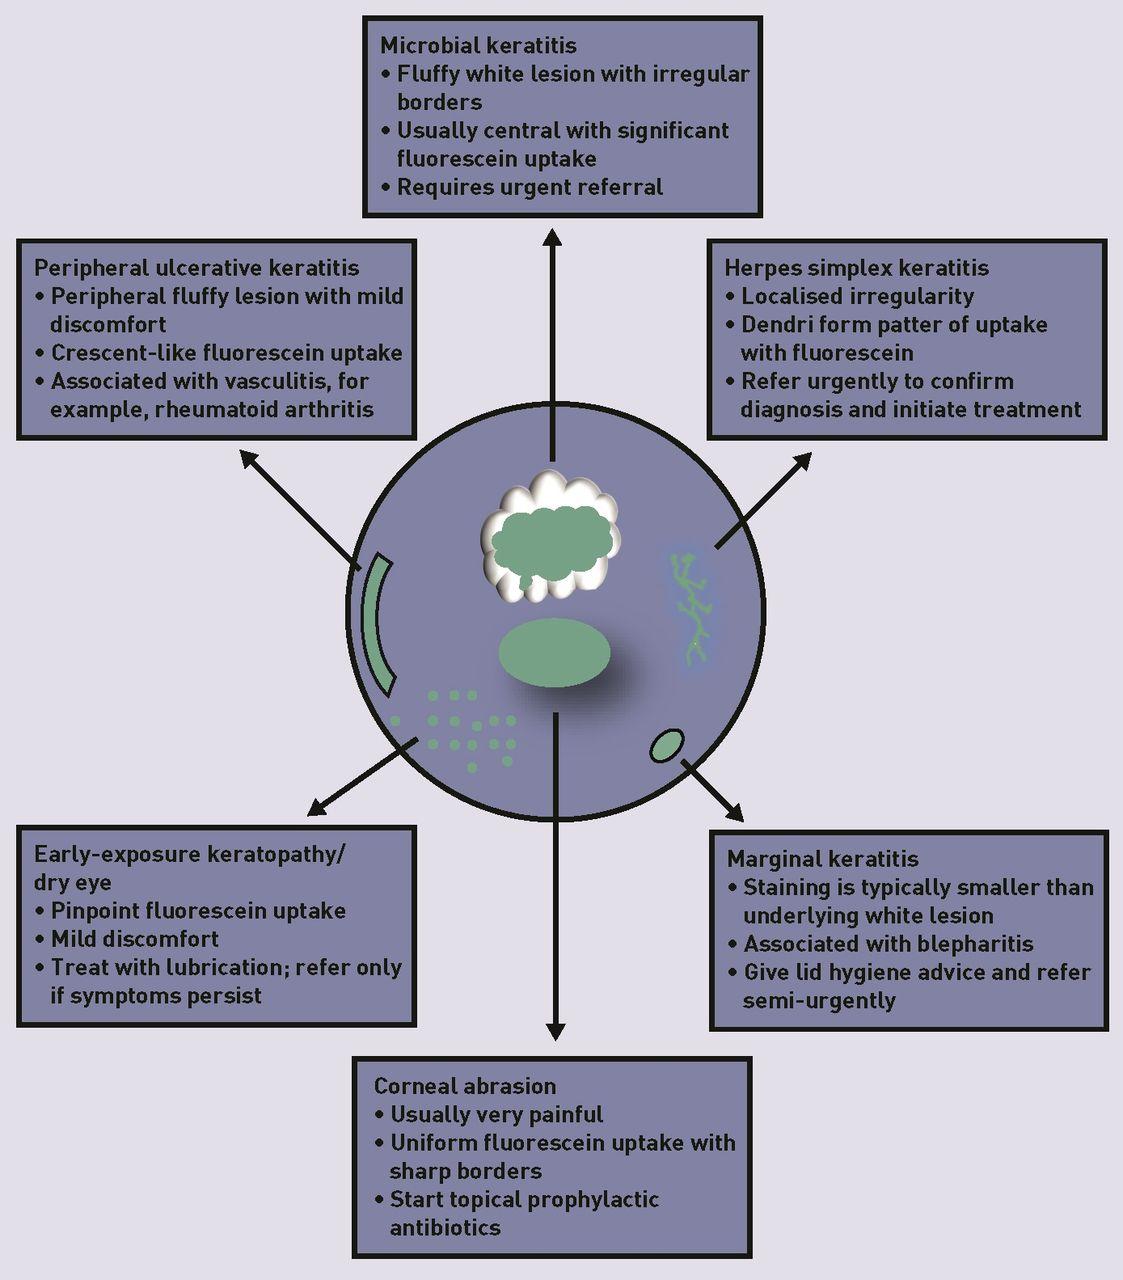 corneal ulcers in general practice british journal of general practice Indolent Corneal Ulcer Diagram